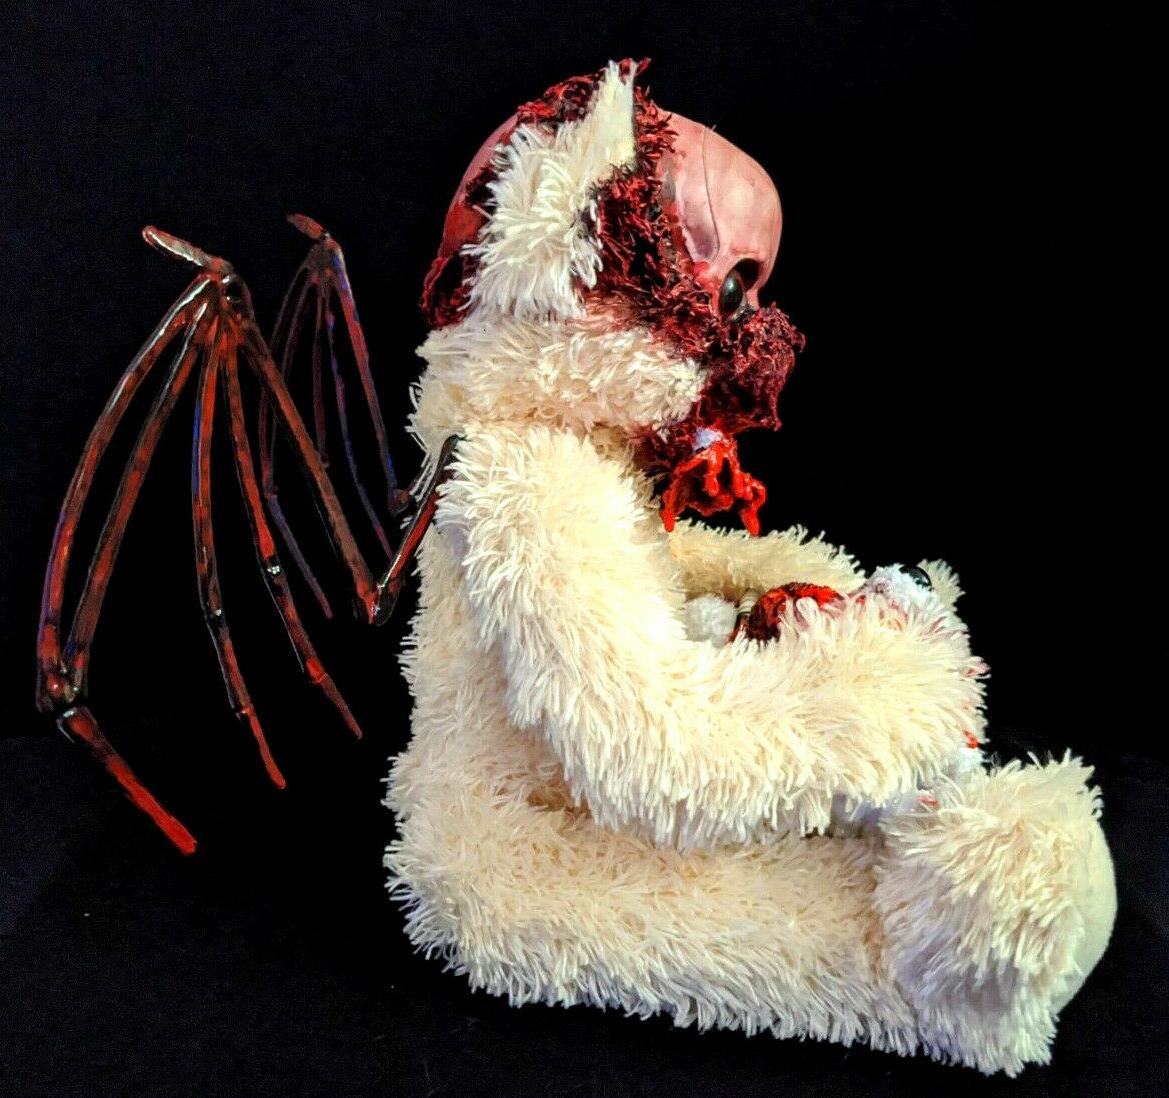 Winged Zombie Teddy Display